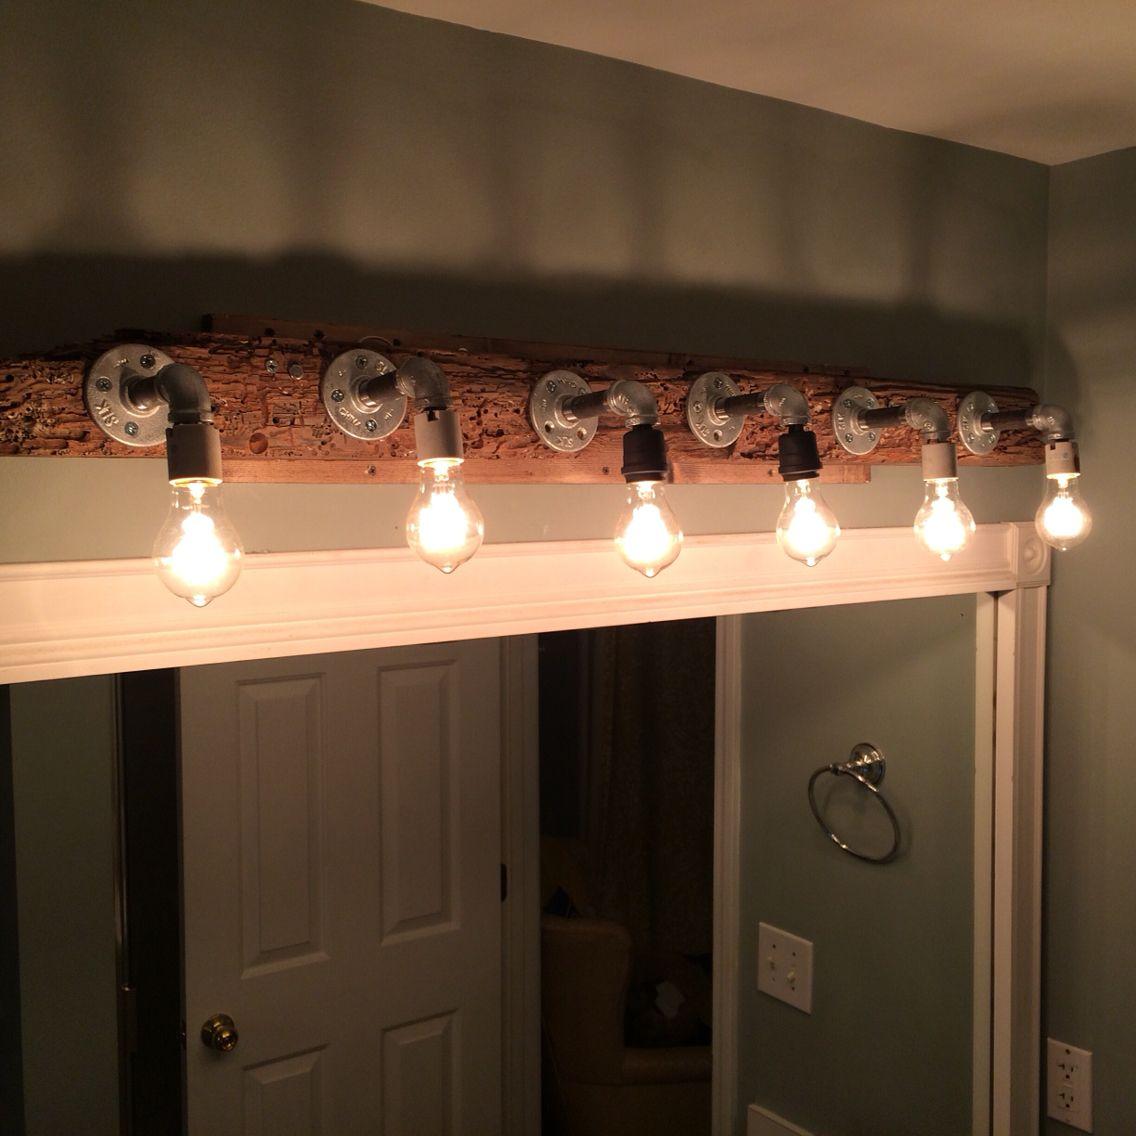 Driftwood bathroom vanity light   We did this!   Pinterest ...